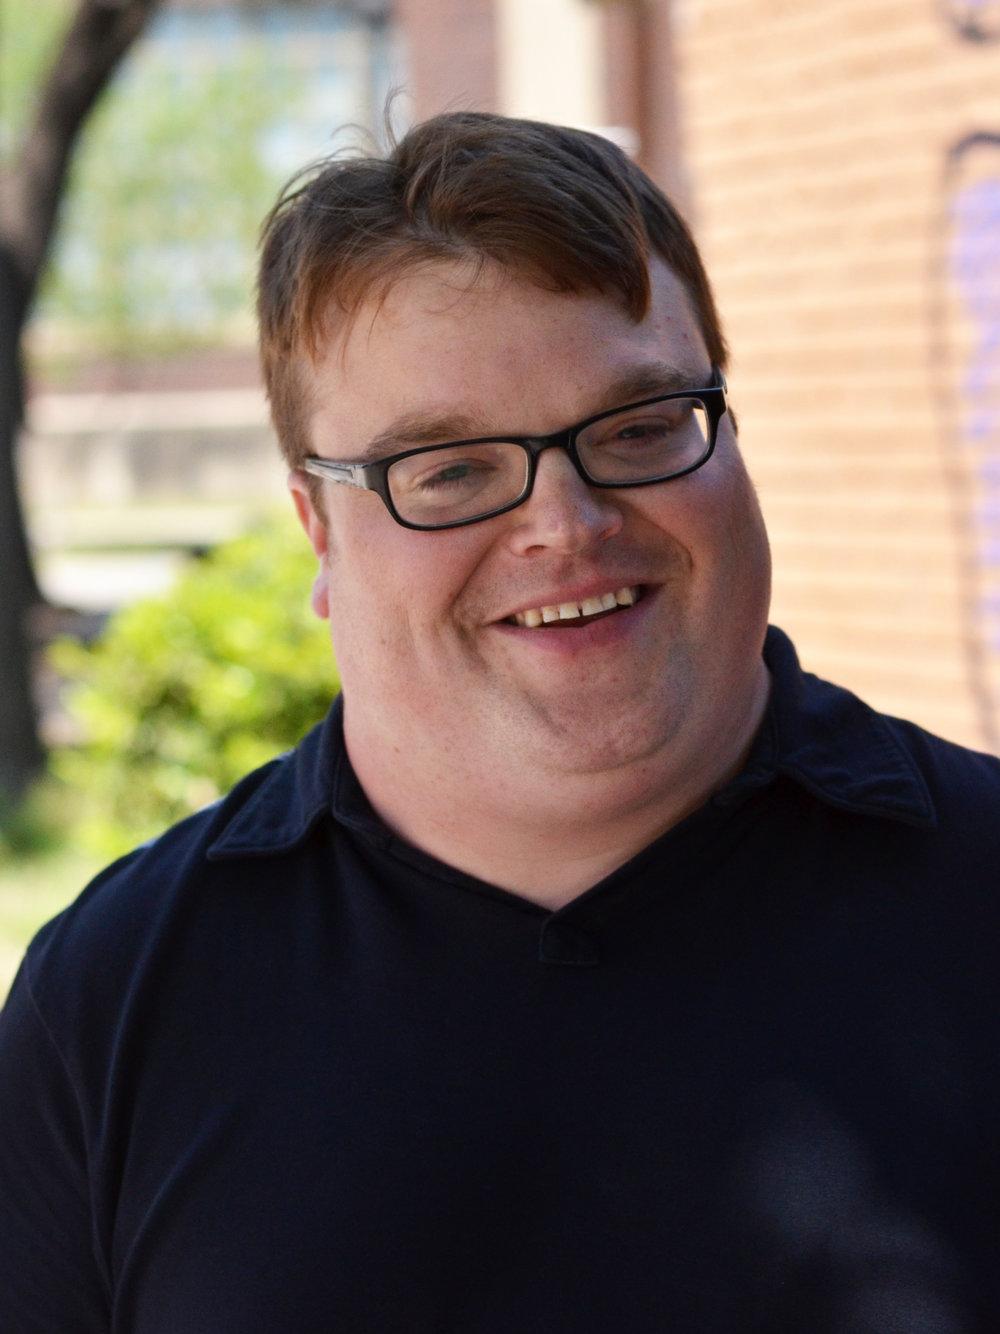 Daniel Sybert